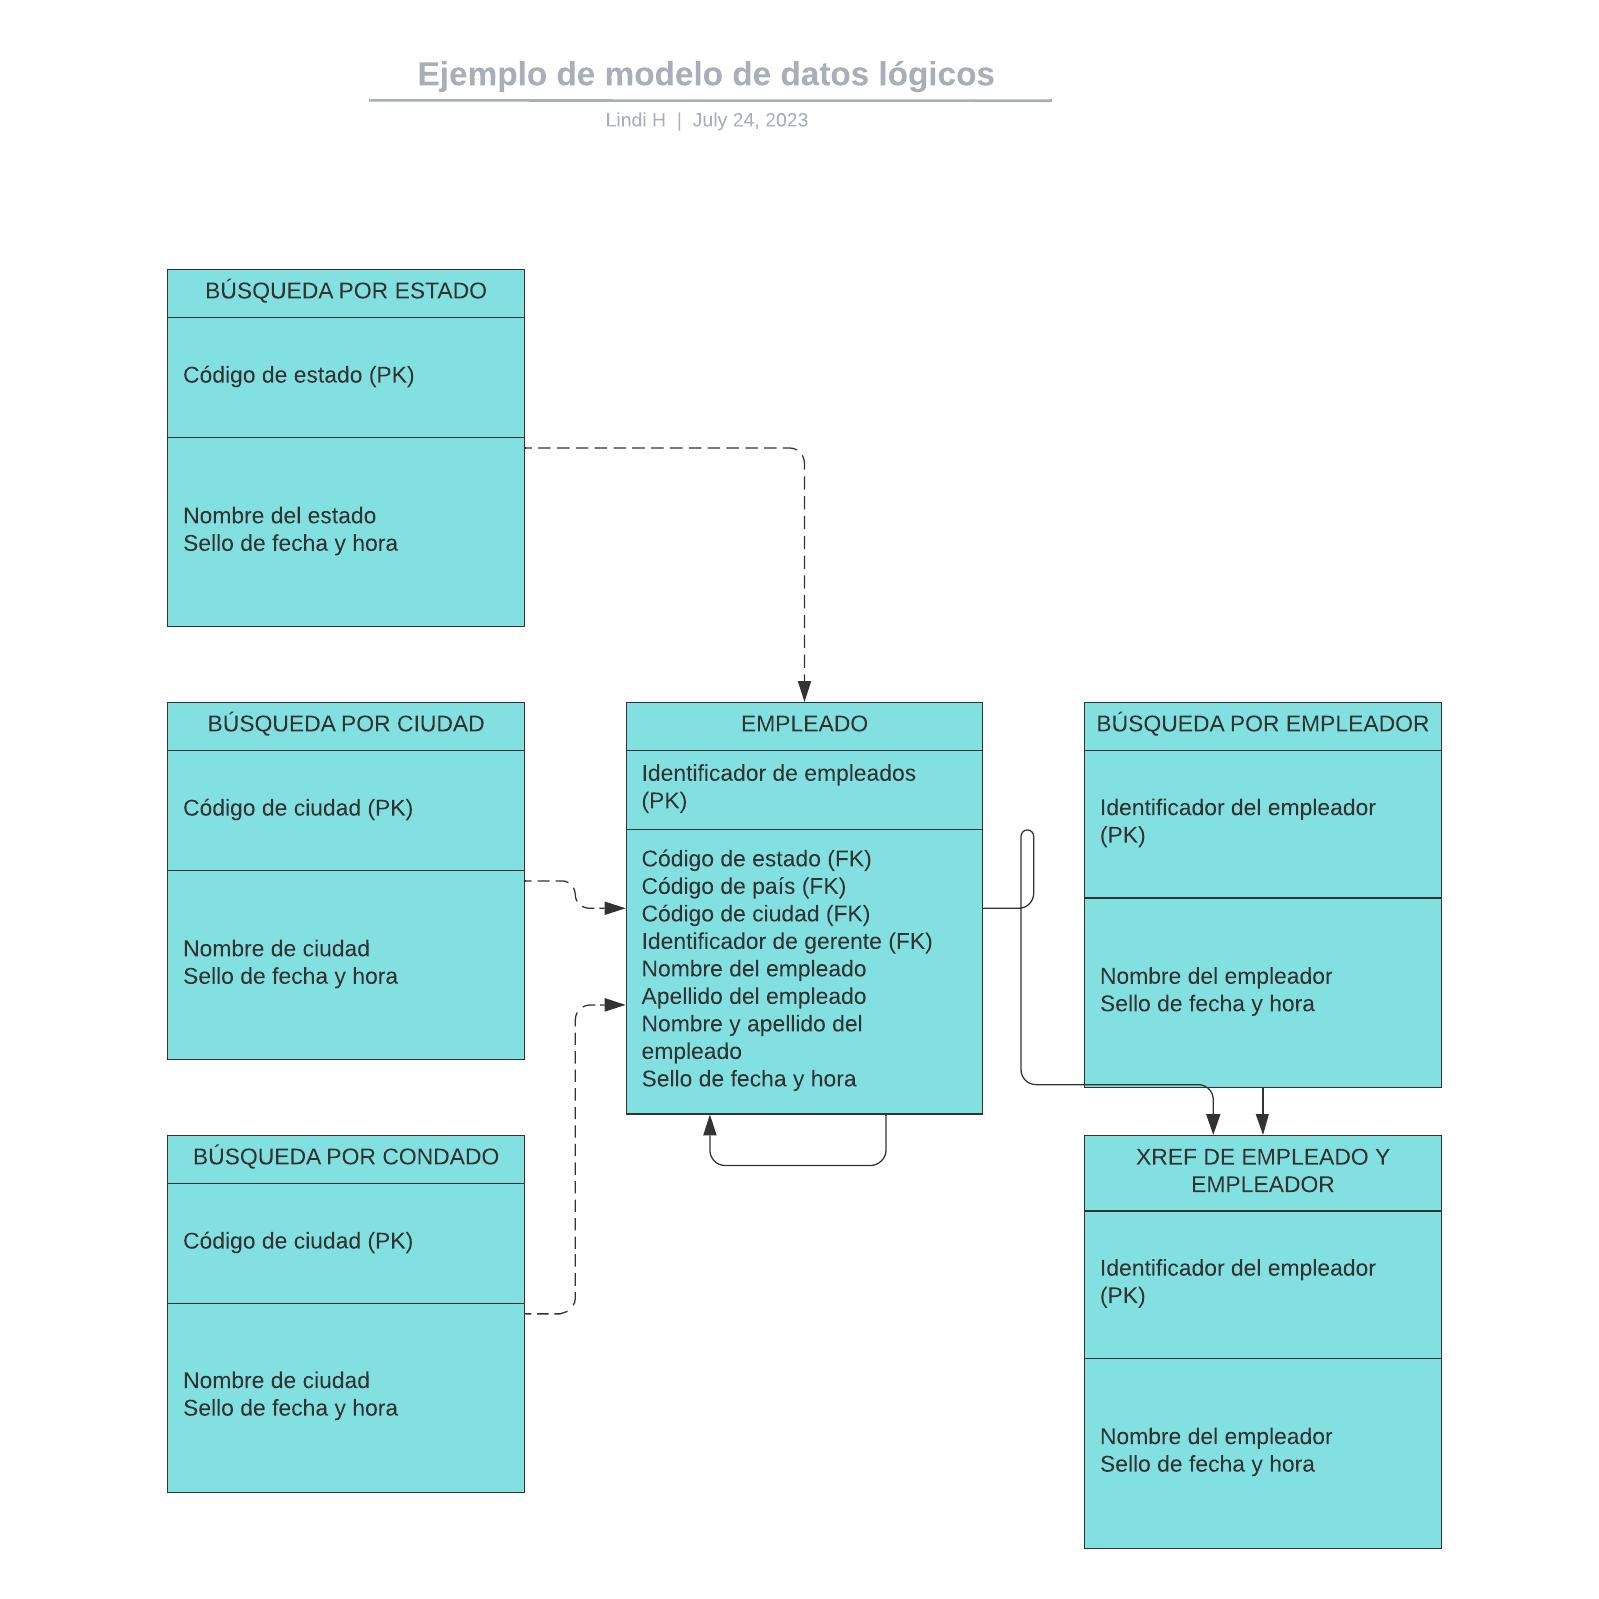 Ejemplo de modelo de datos lógicos